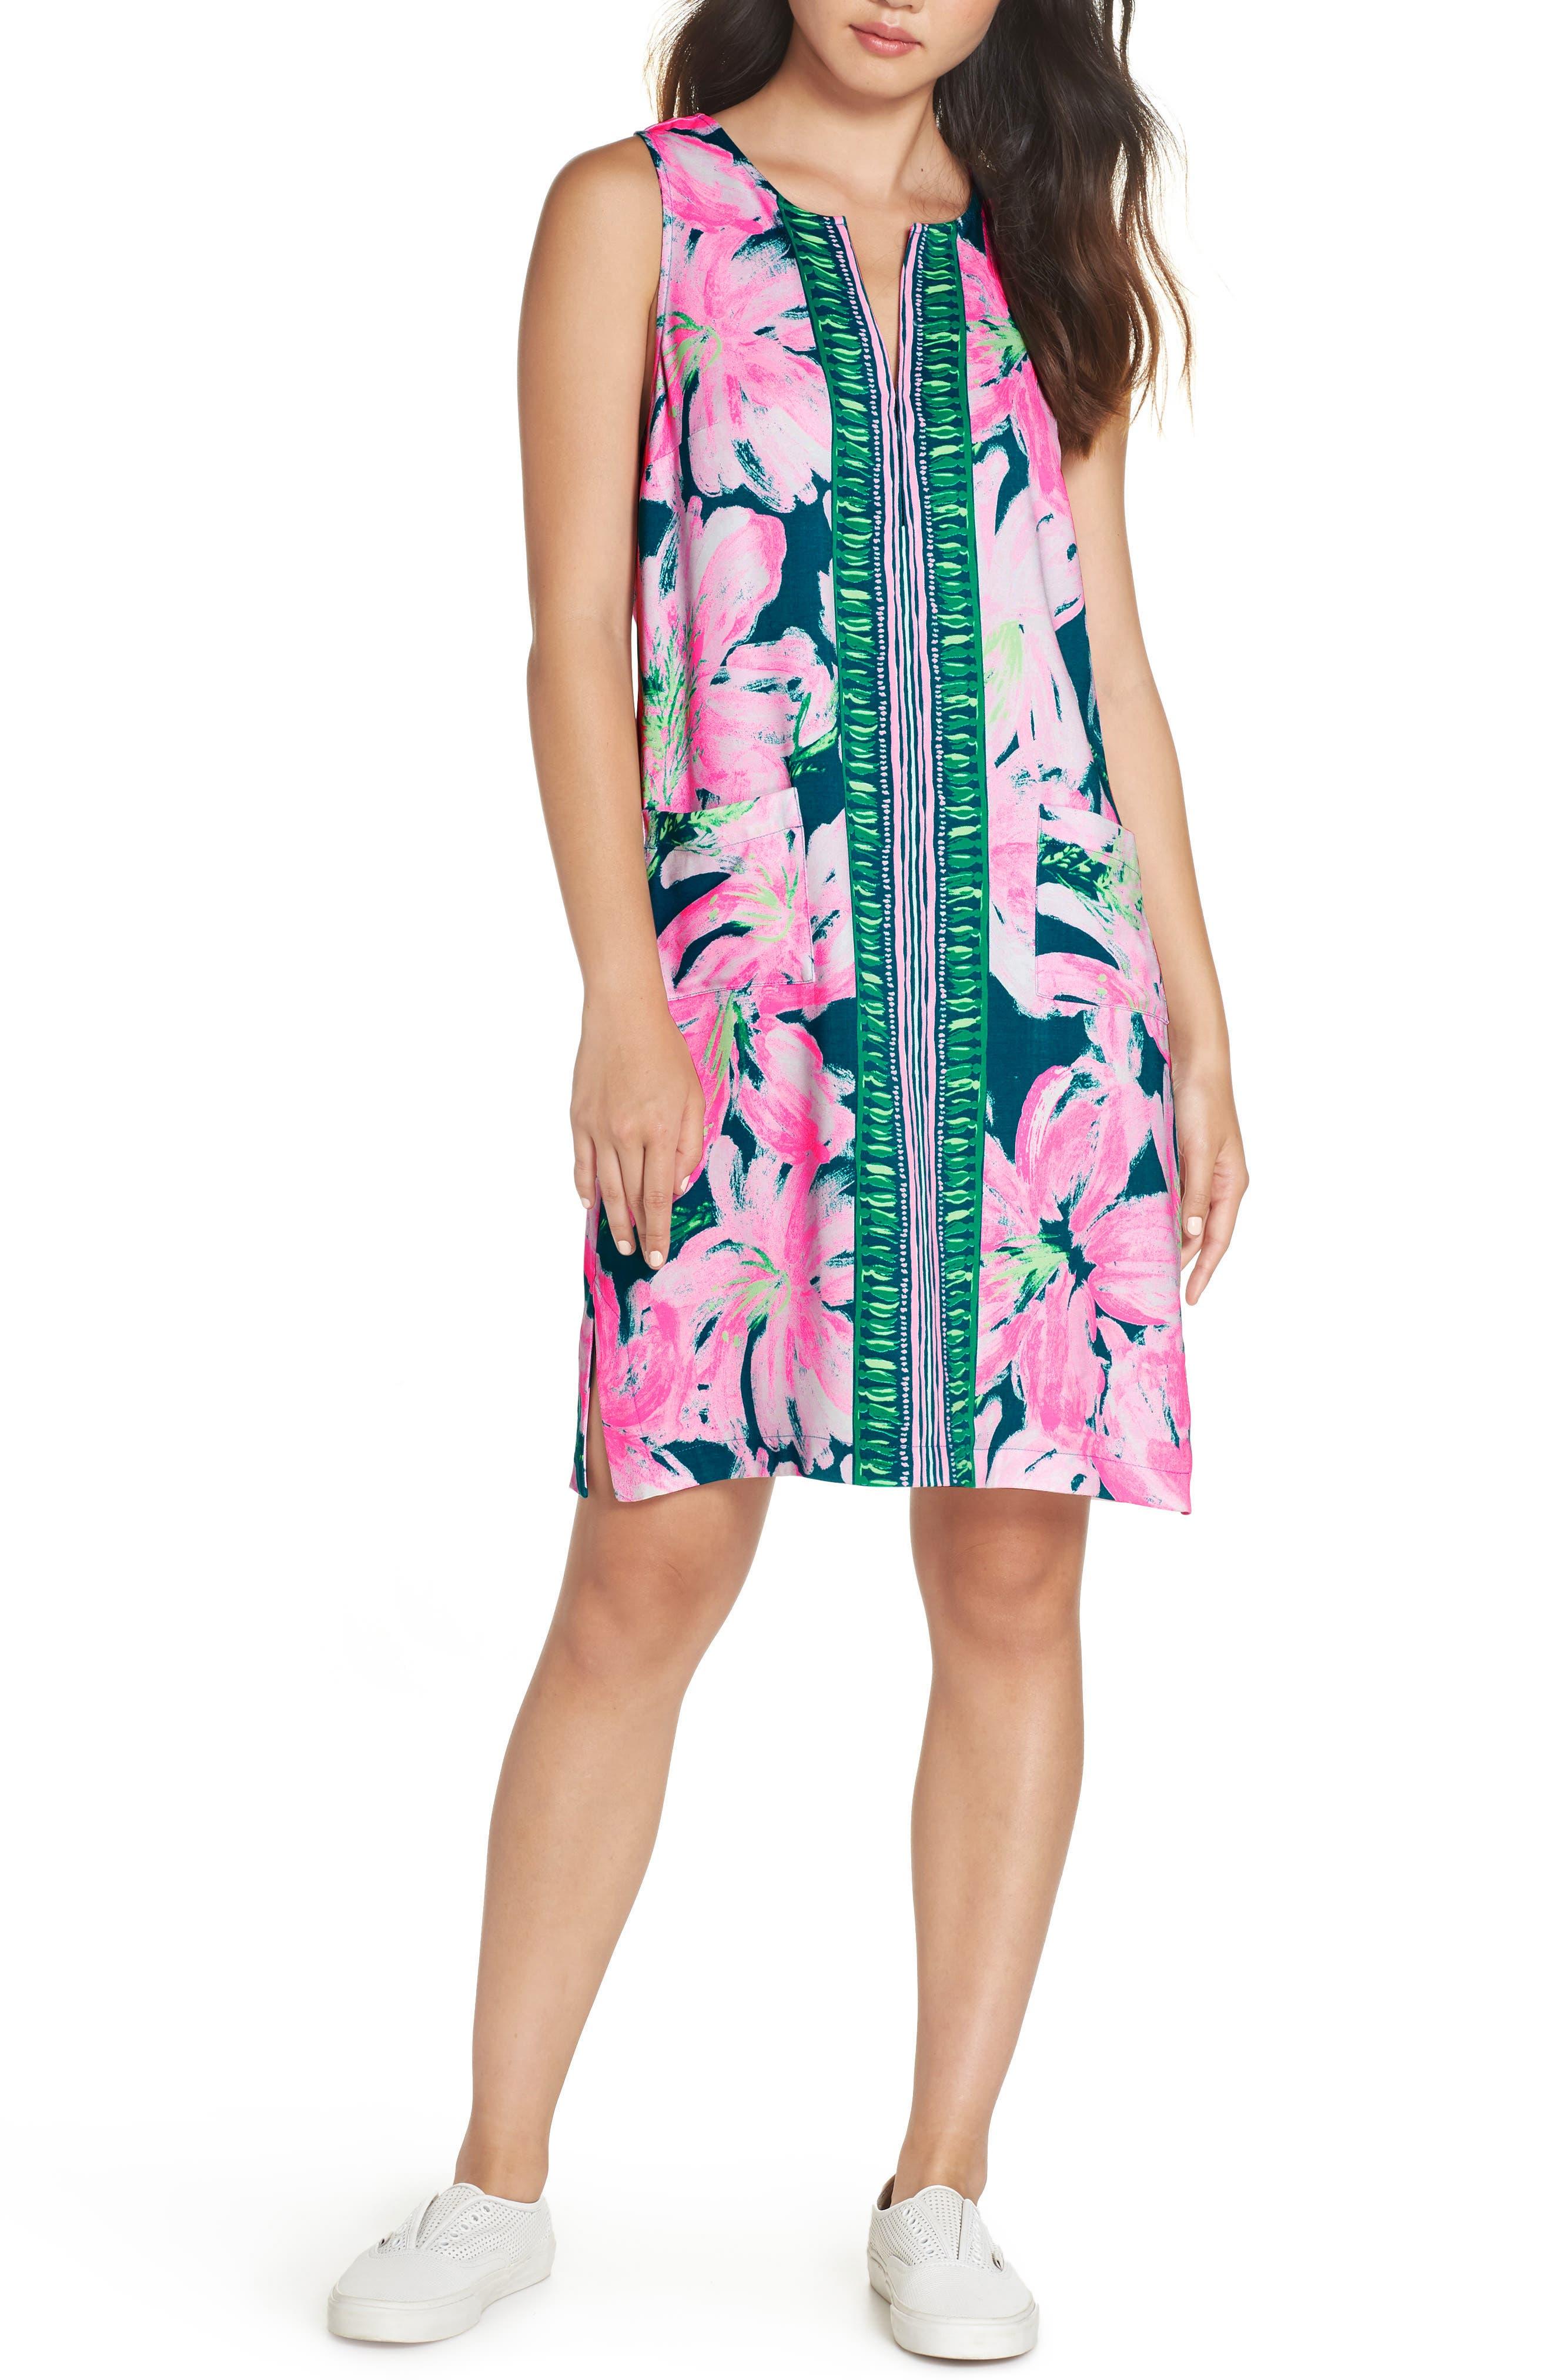 Lilly Pulitzer Carlotta Shift Dress, Blue/green